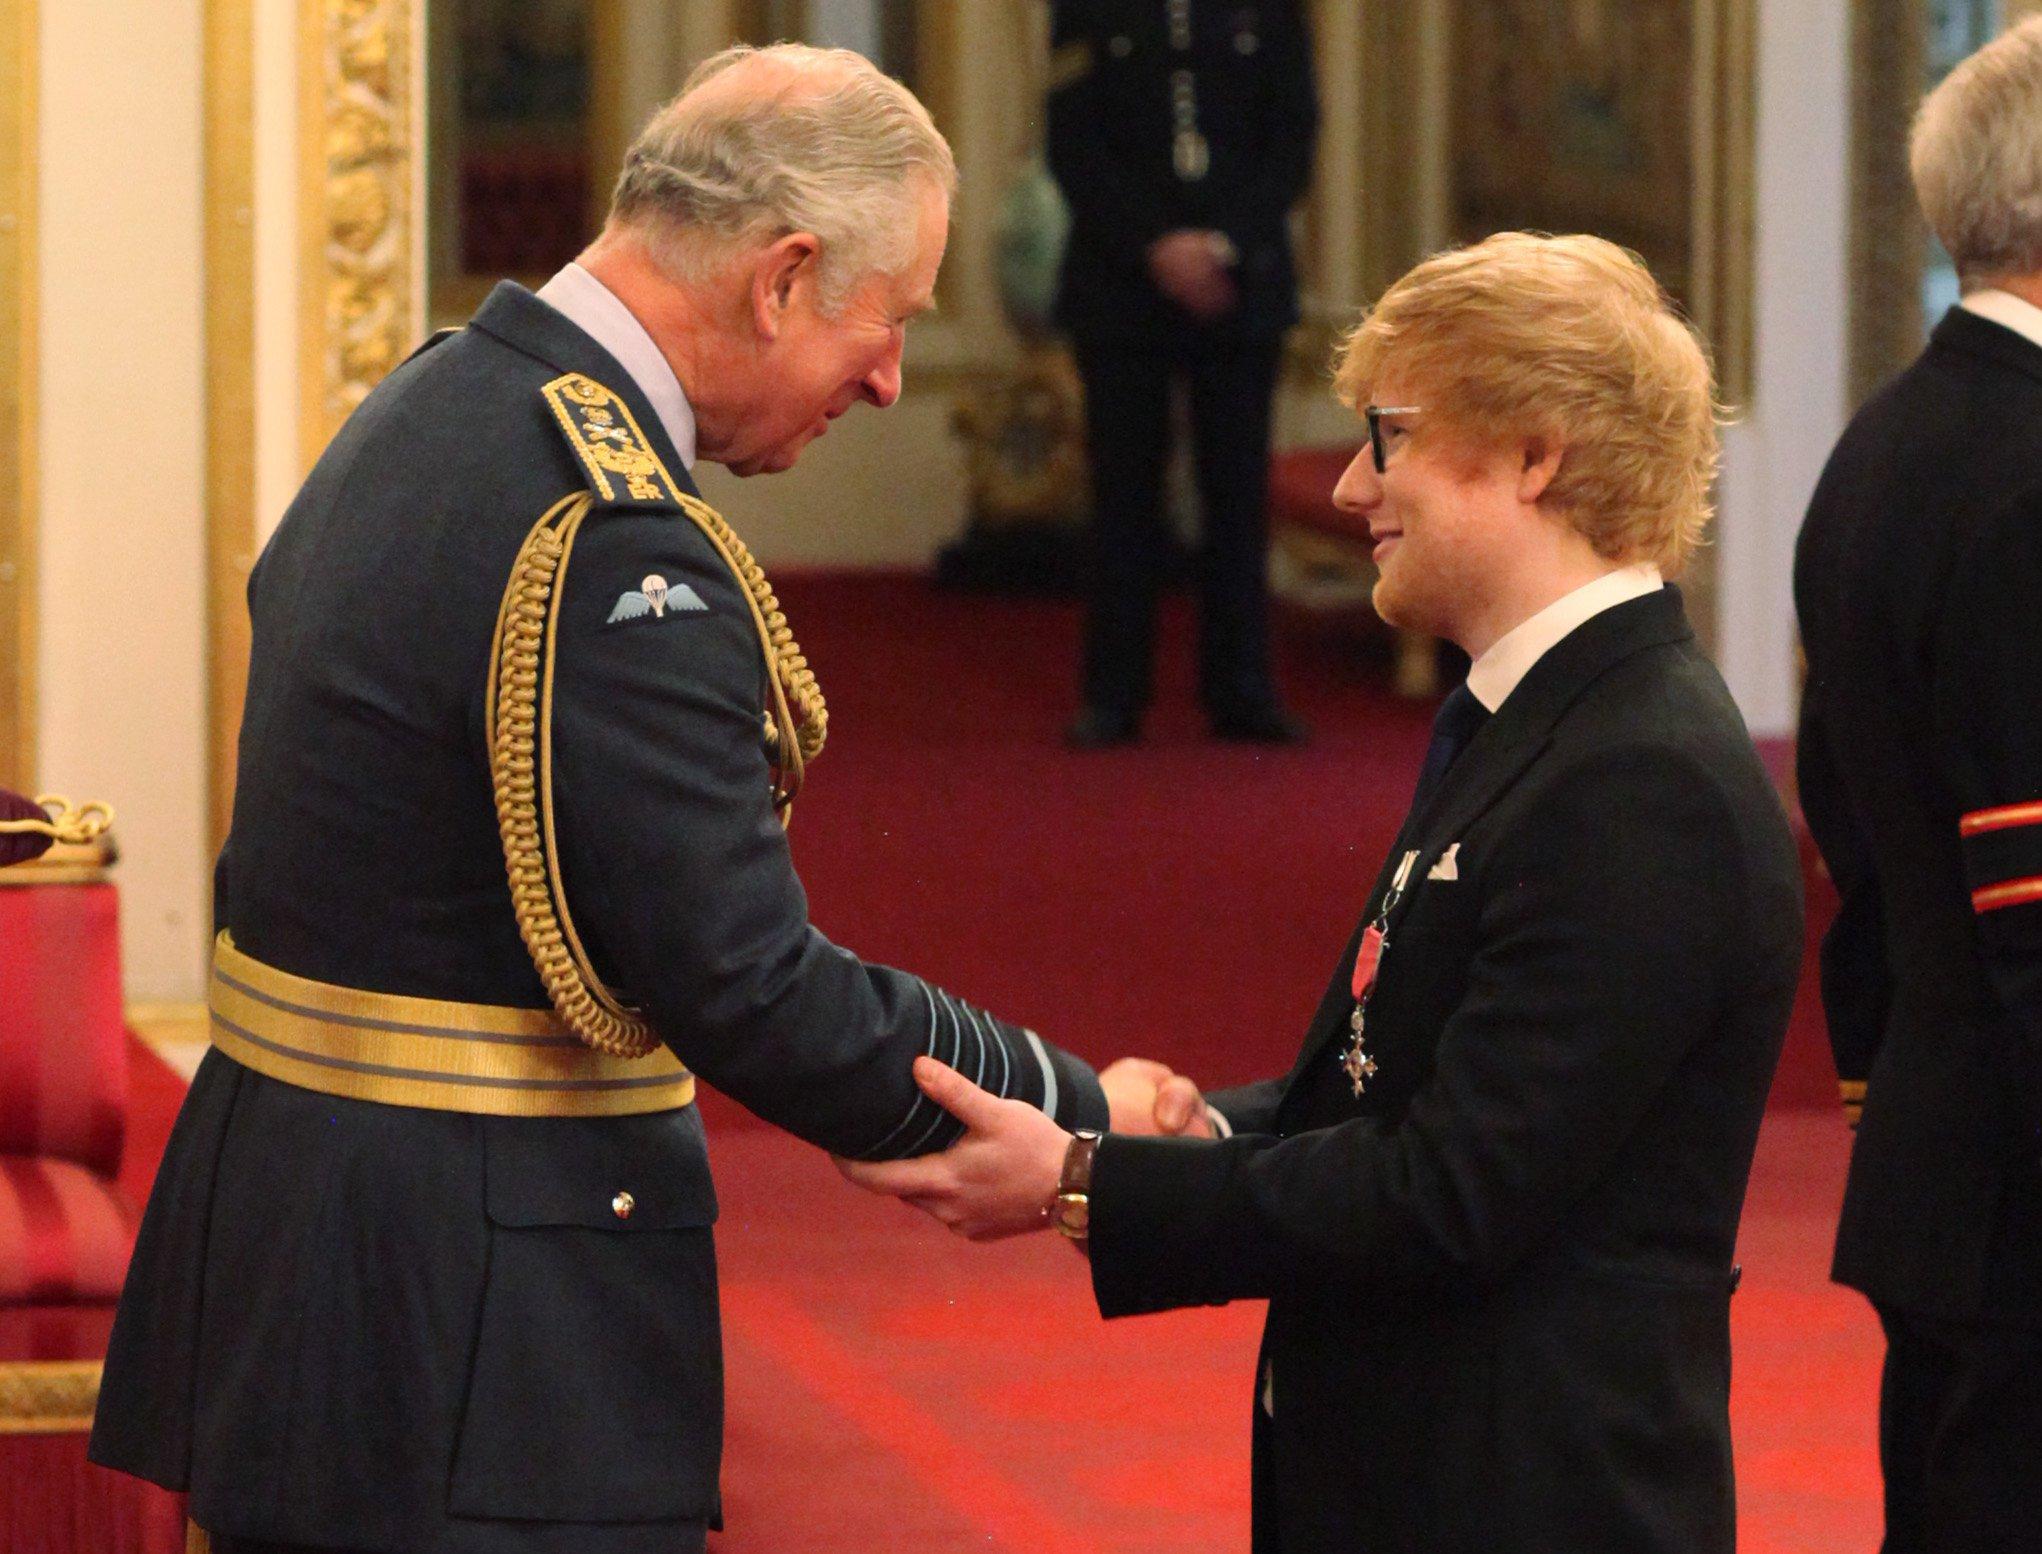 Ed Sheeran receives MBE